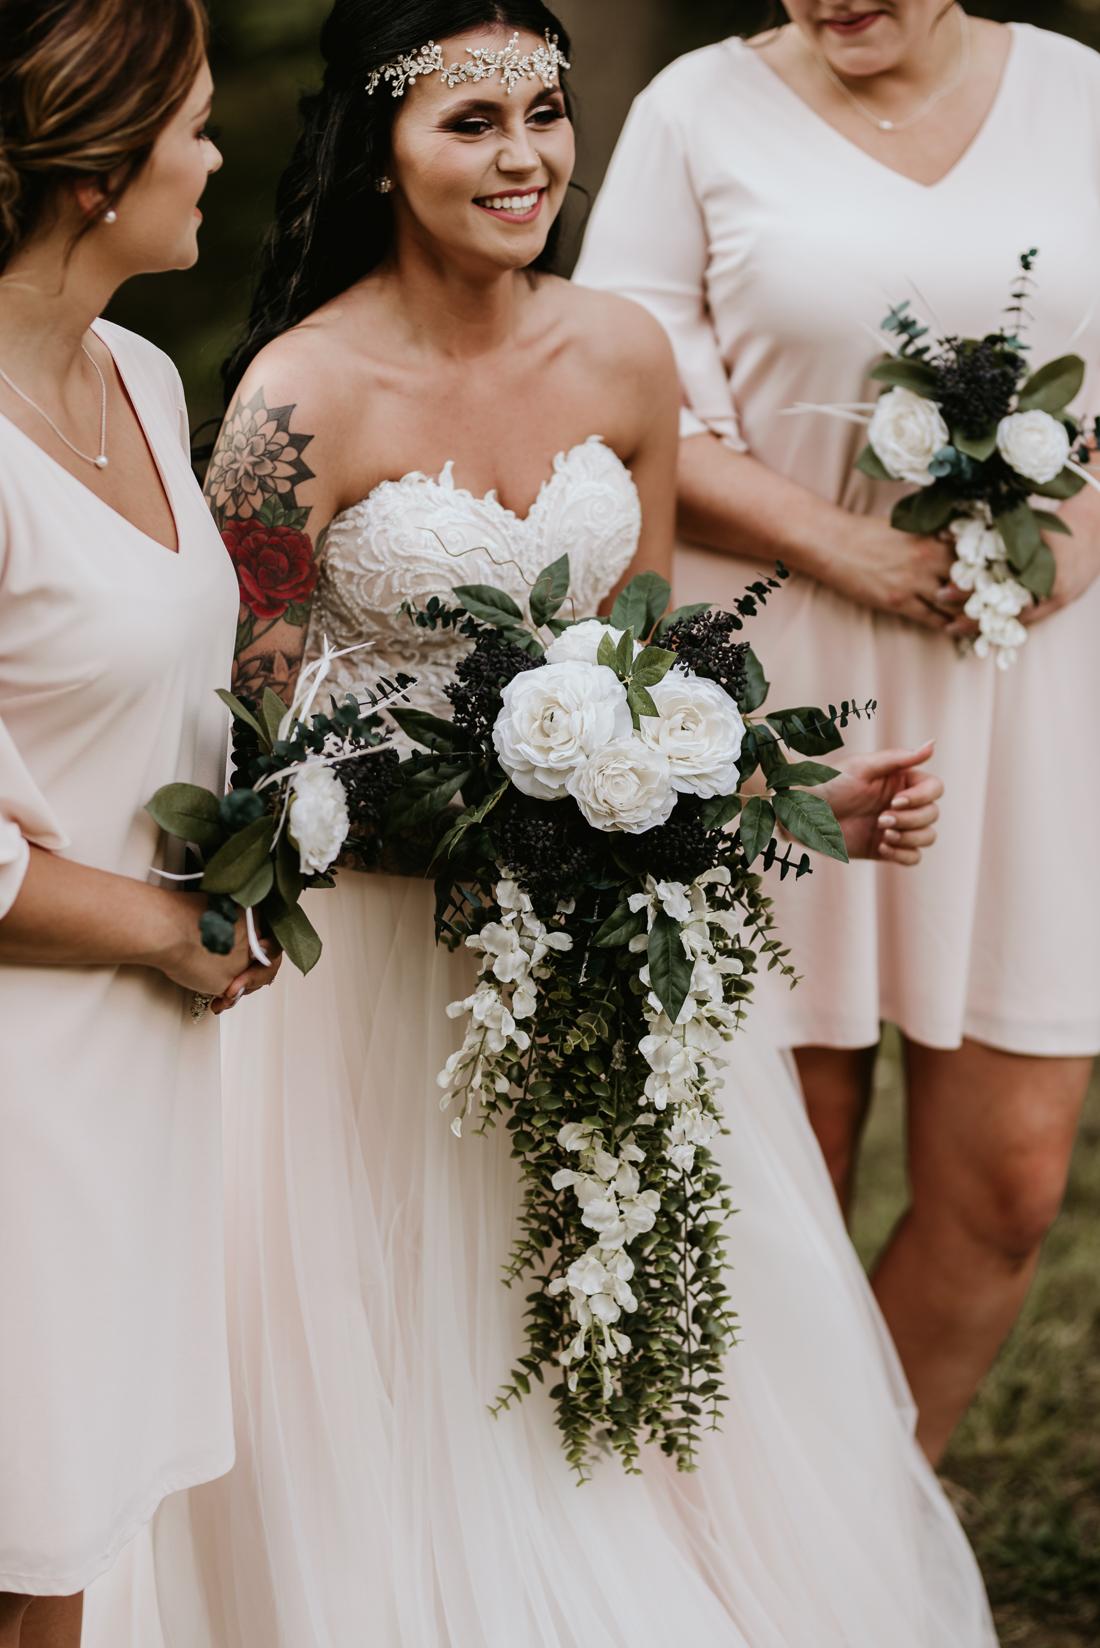 olivia_zay_wedding_09_2018-7489.jpg